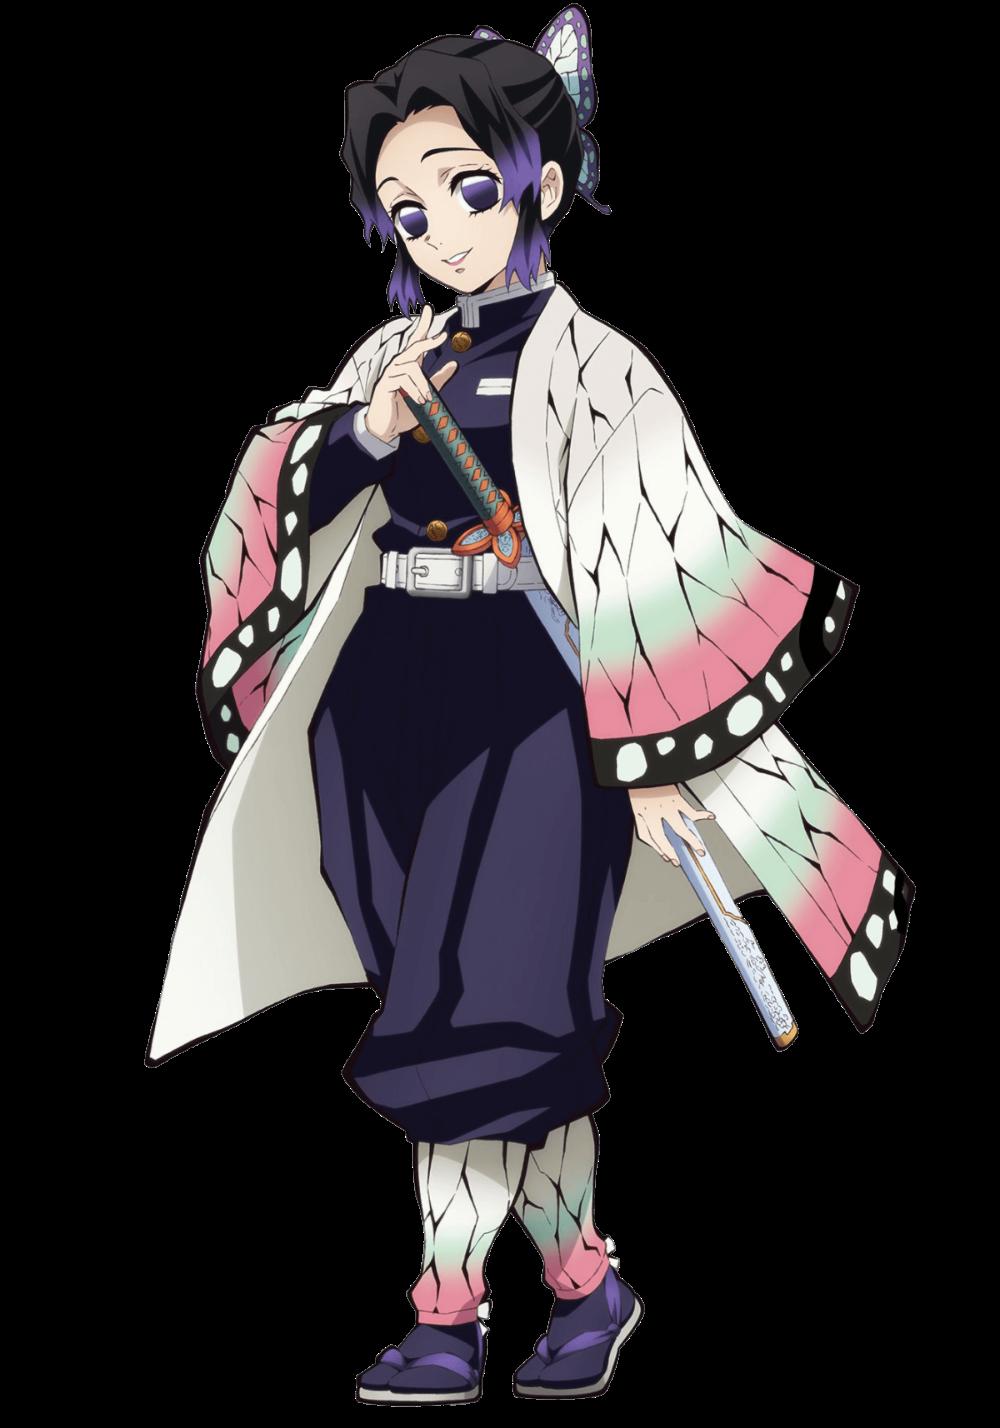 Kimetsu No Yaiba ดาบพ ฆาตอส ร แนะนำต วละคร ท นจ โร กล มน กล าอส ร และ เสาหล ก 11 Anime Demon Slayer Anime Anime Characters